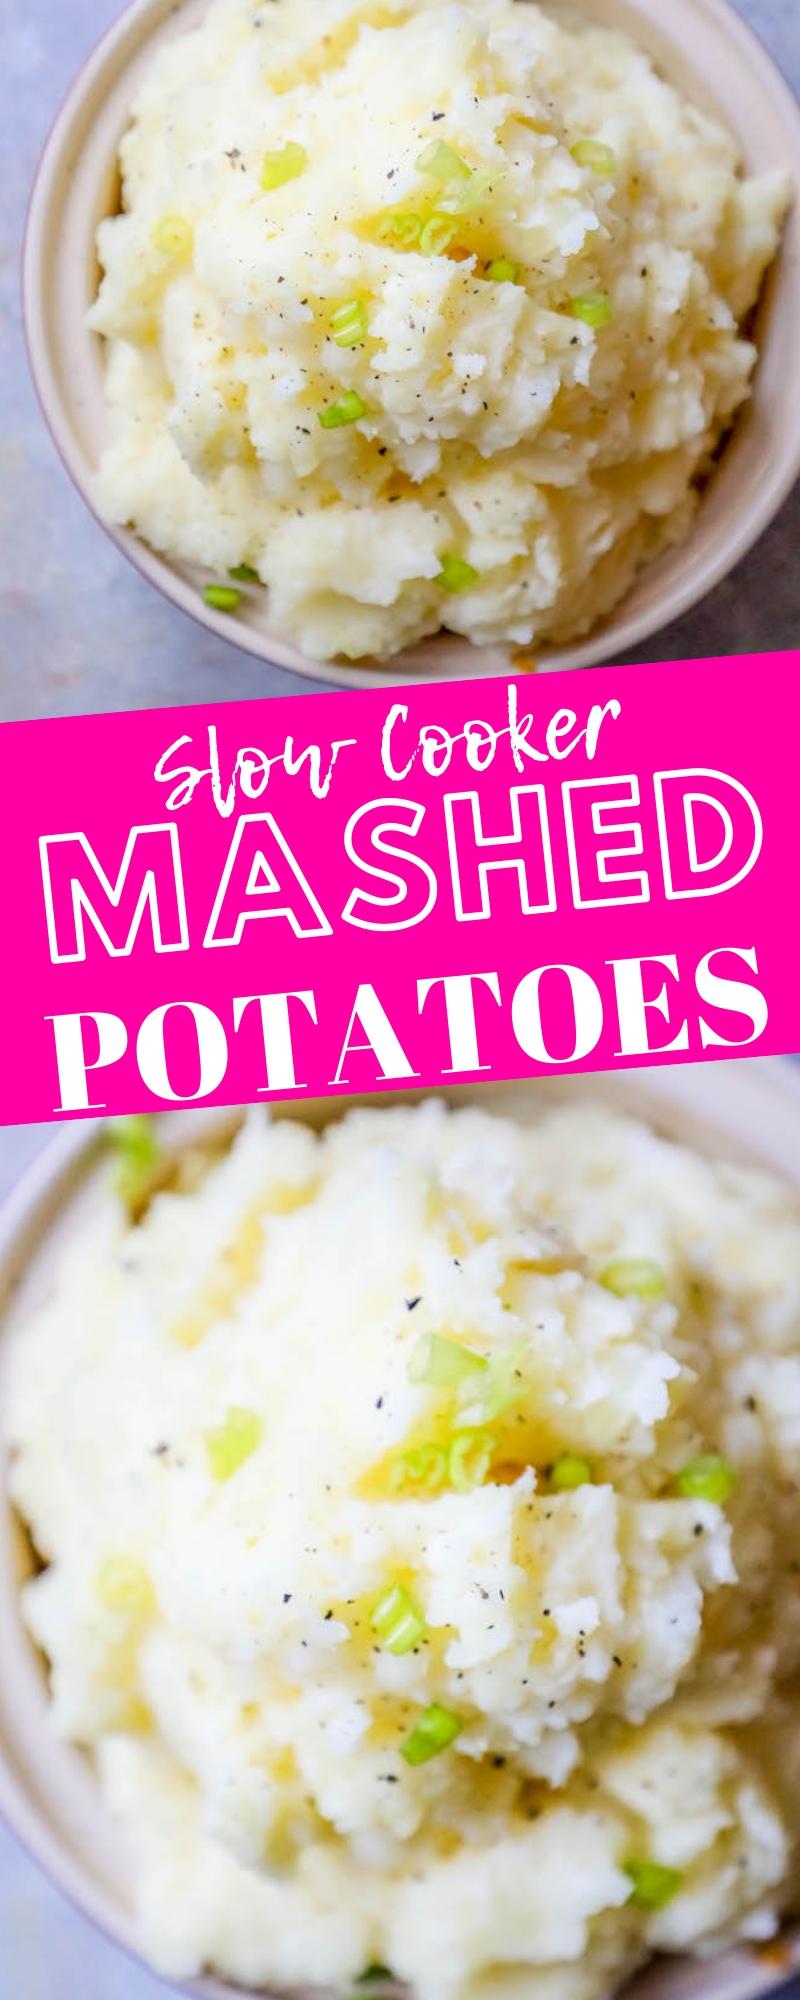 Slow Cooker Mashed Potatoes - Sweet Cs Designs